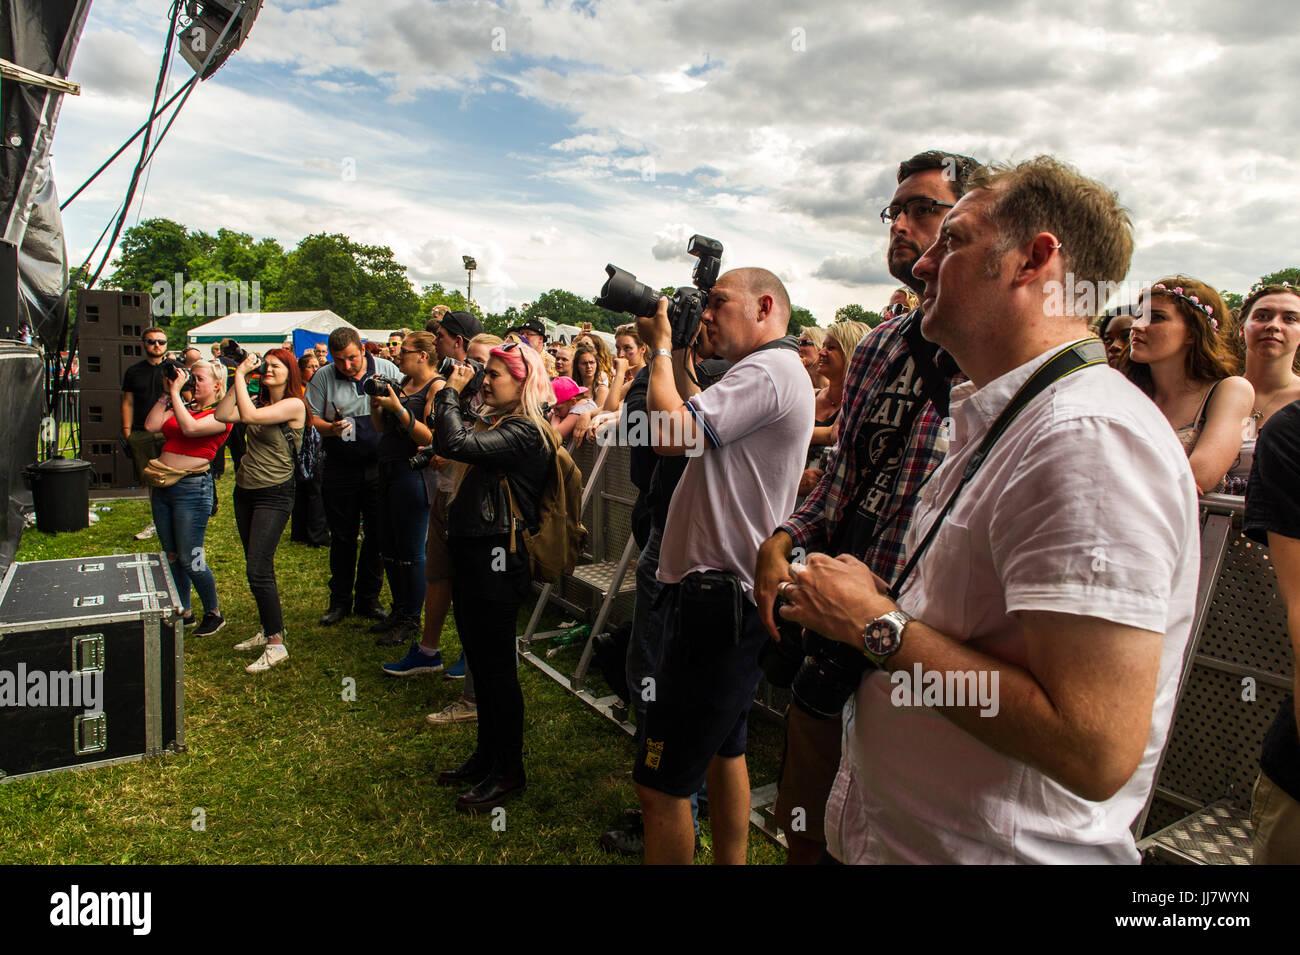 photographers-pit-at-godiva-music-festival-2017-coventry-uk-JJ7WYN.jpg